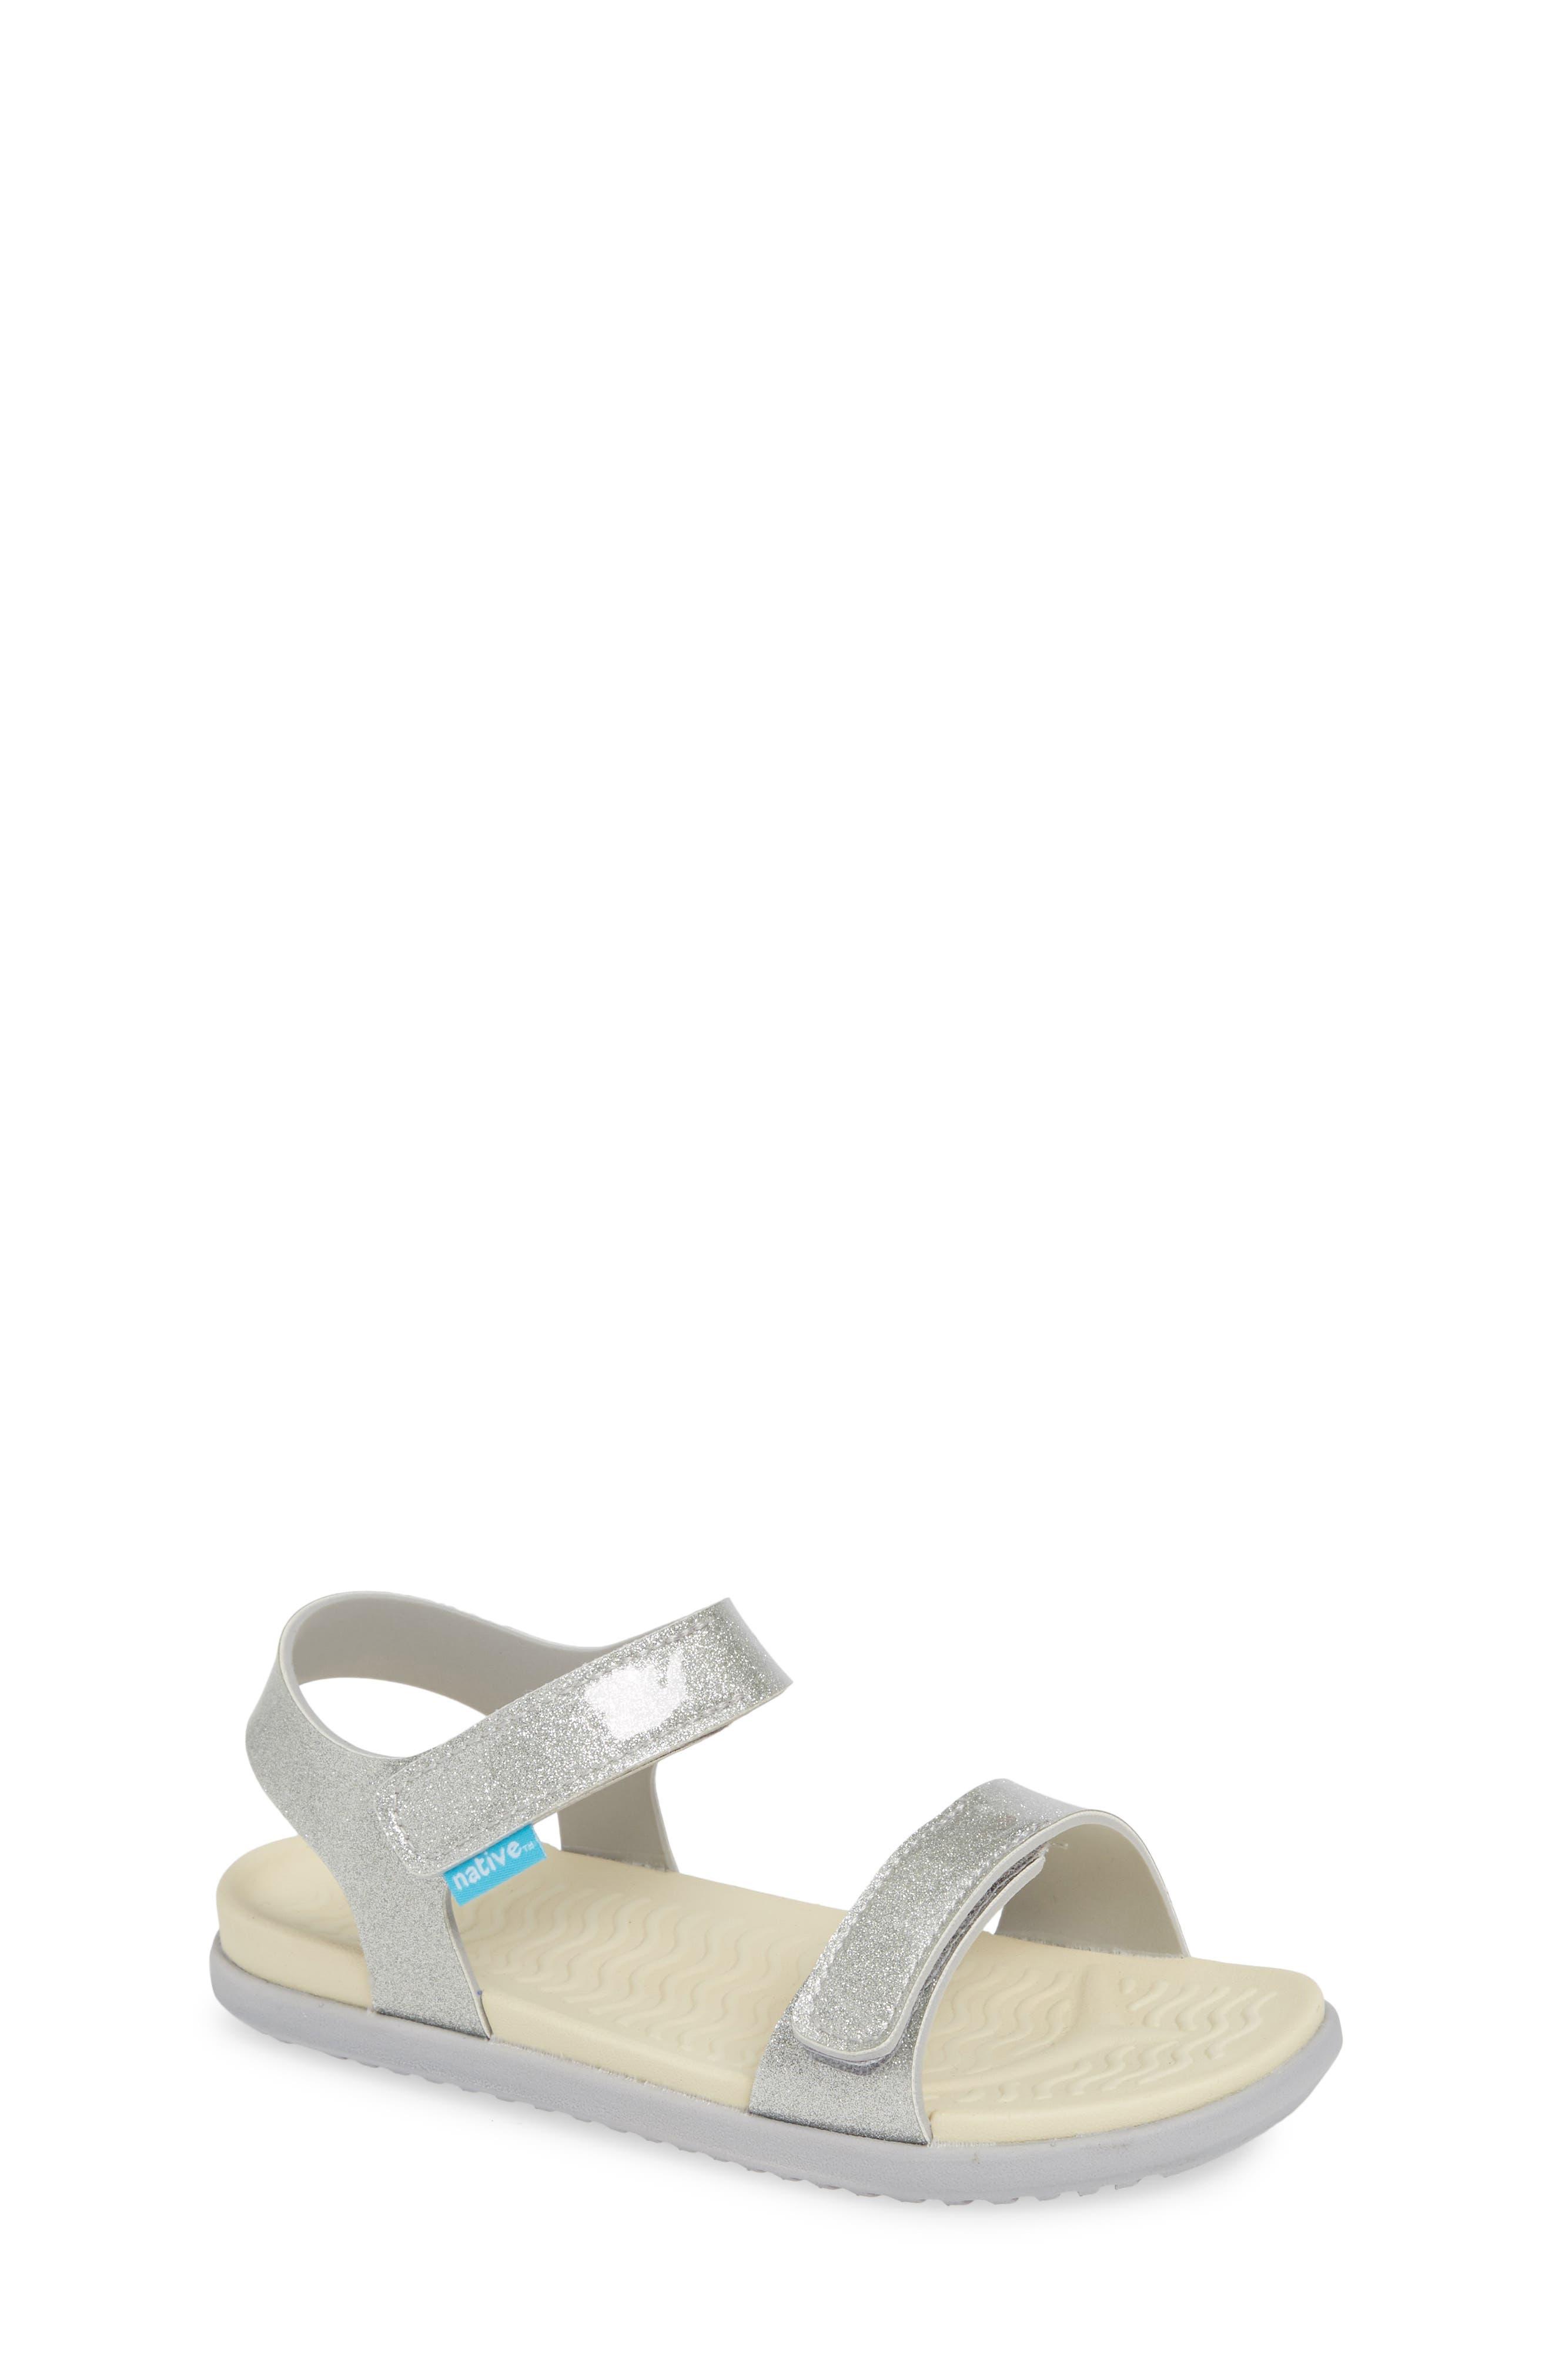 Charley Child Waterproof Flat Vegan Sandal, Main, color, SILVER GLITTER/ WHITE/ GREY